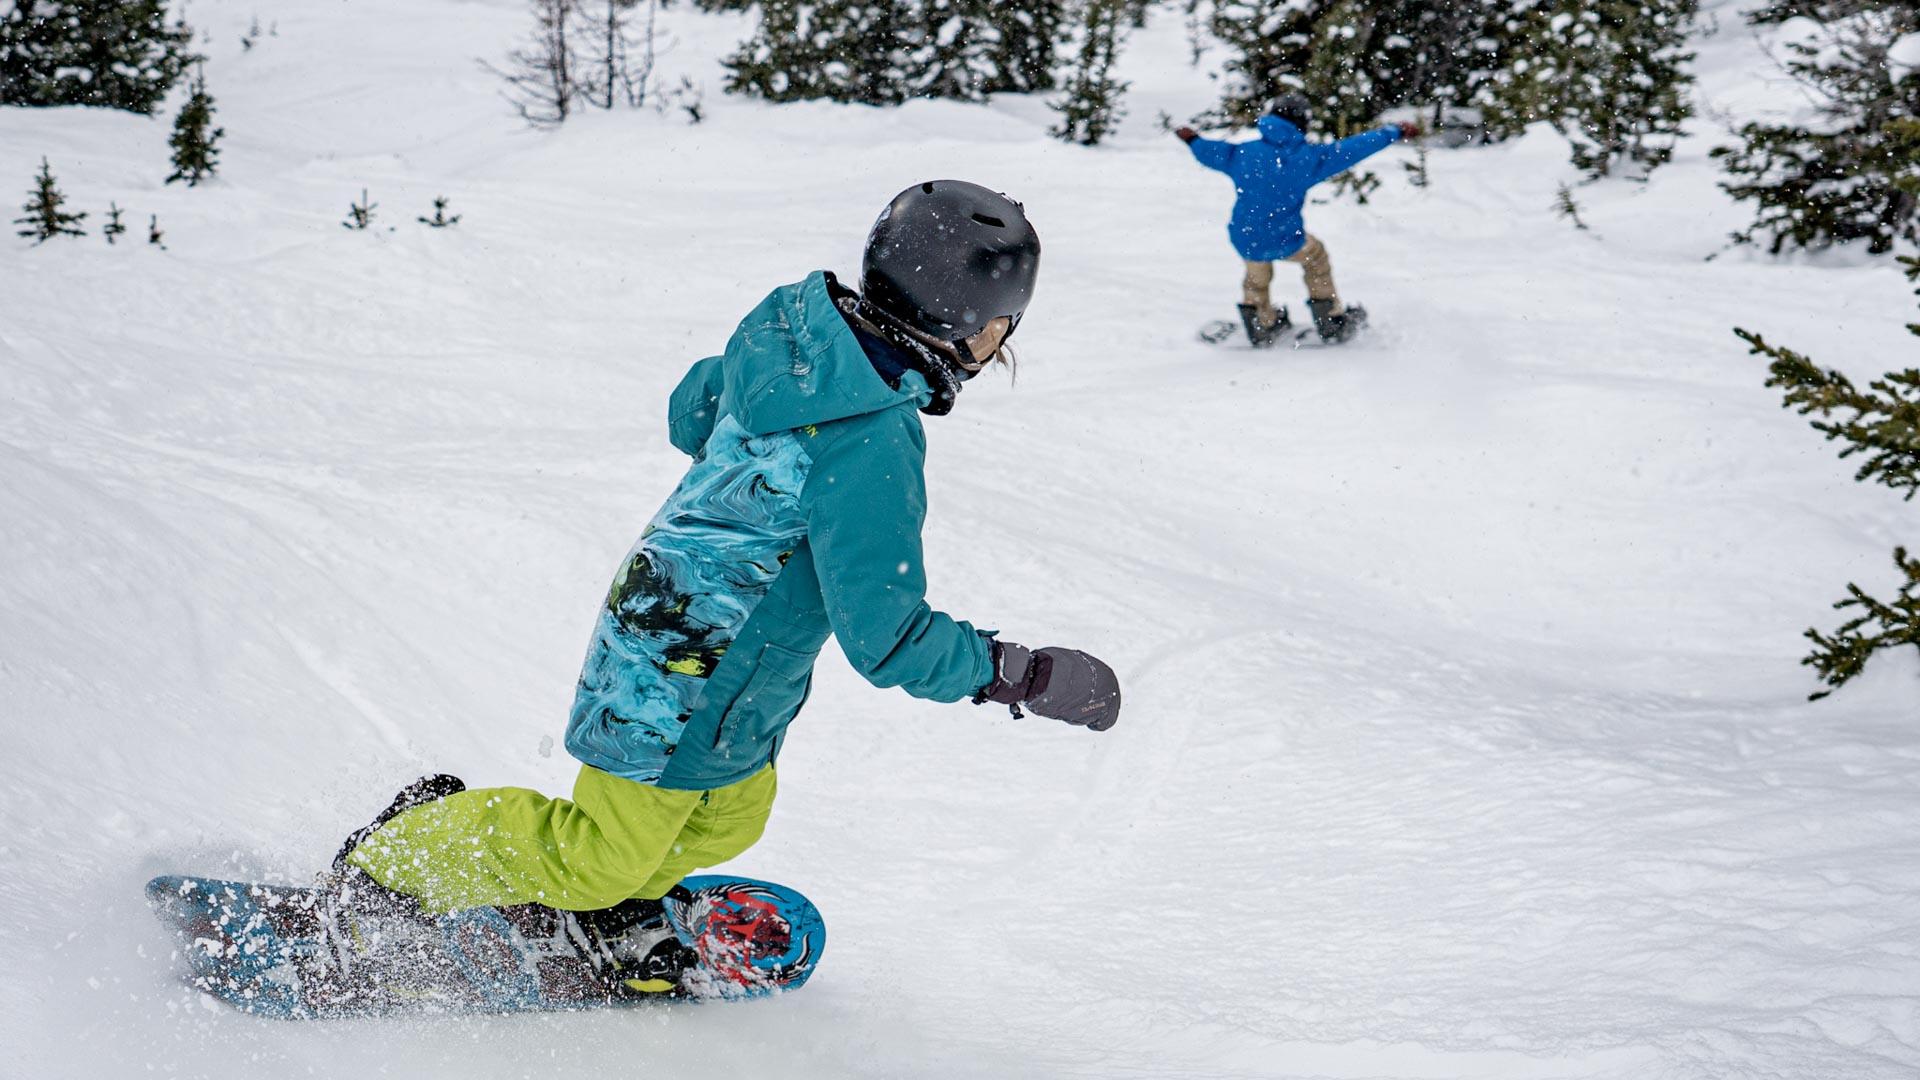 Boys snowboarding at Banff Sunshine Village, Banff National Park.